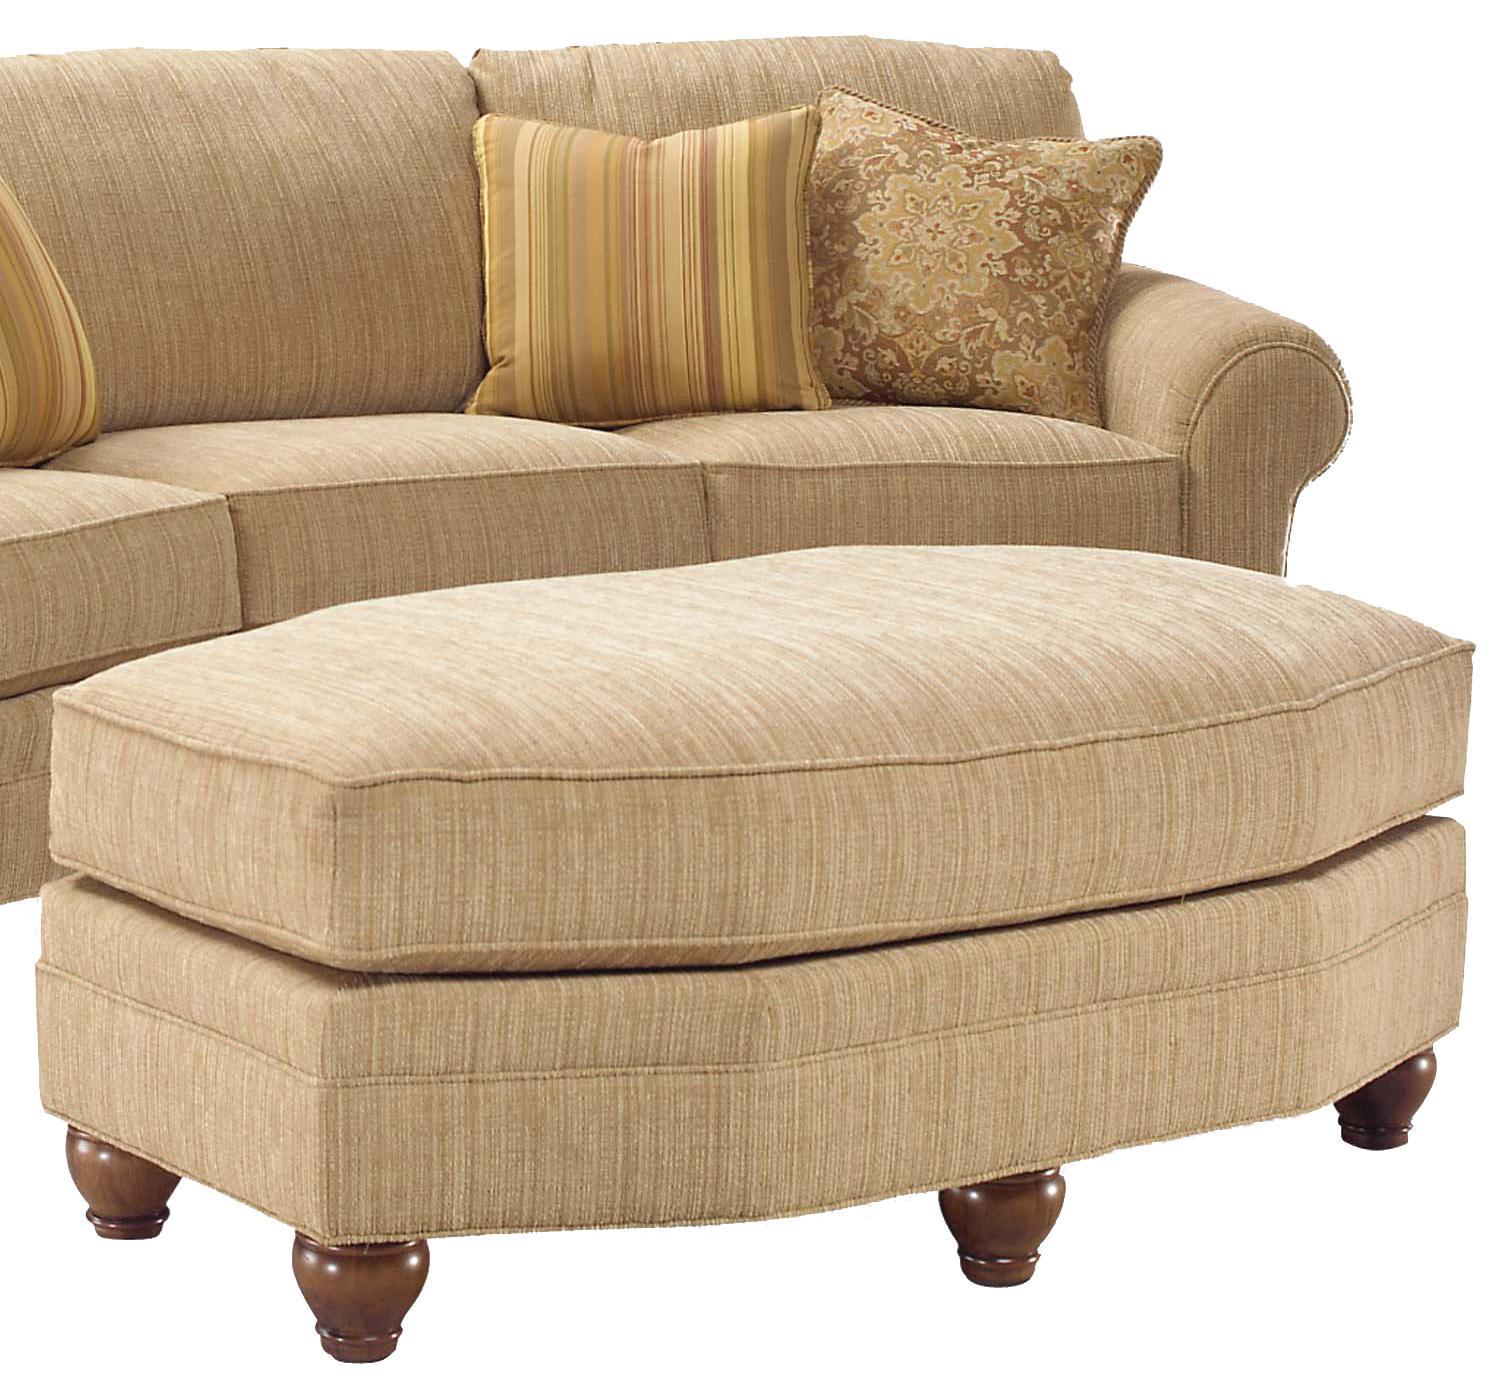 3768 Oval Ottoman by Fairfield at Jacksonville Furniture Mart